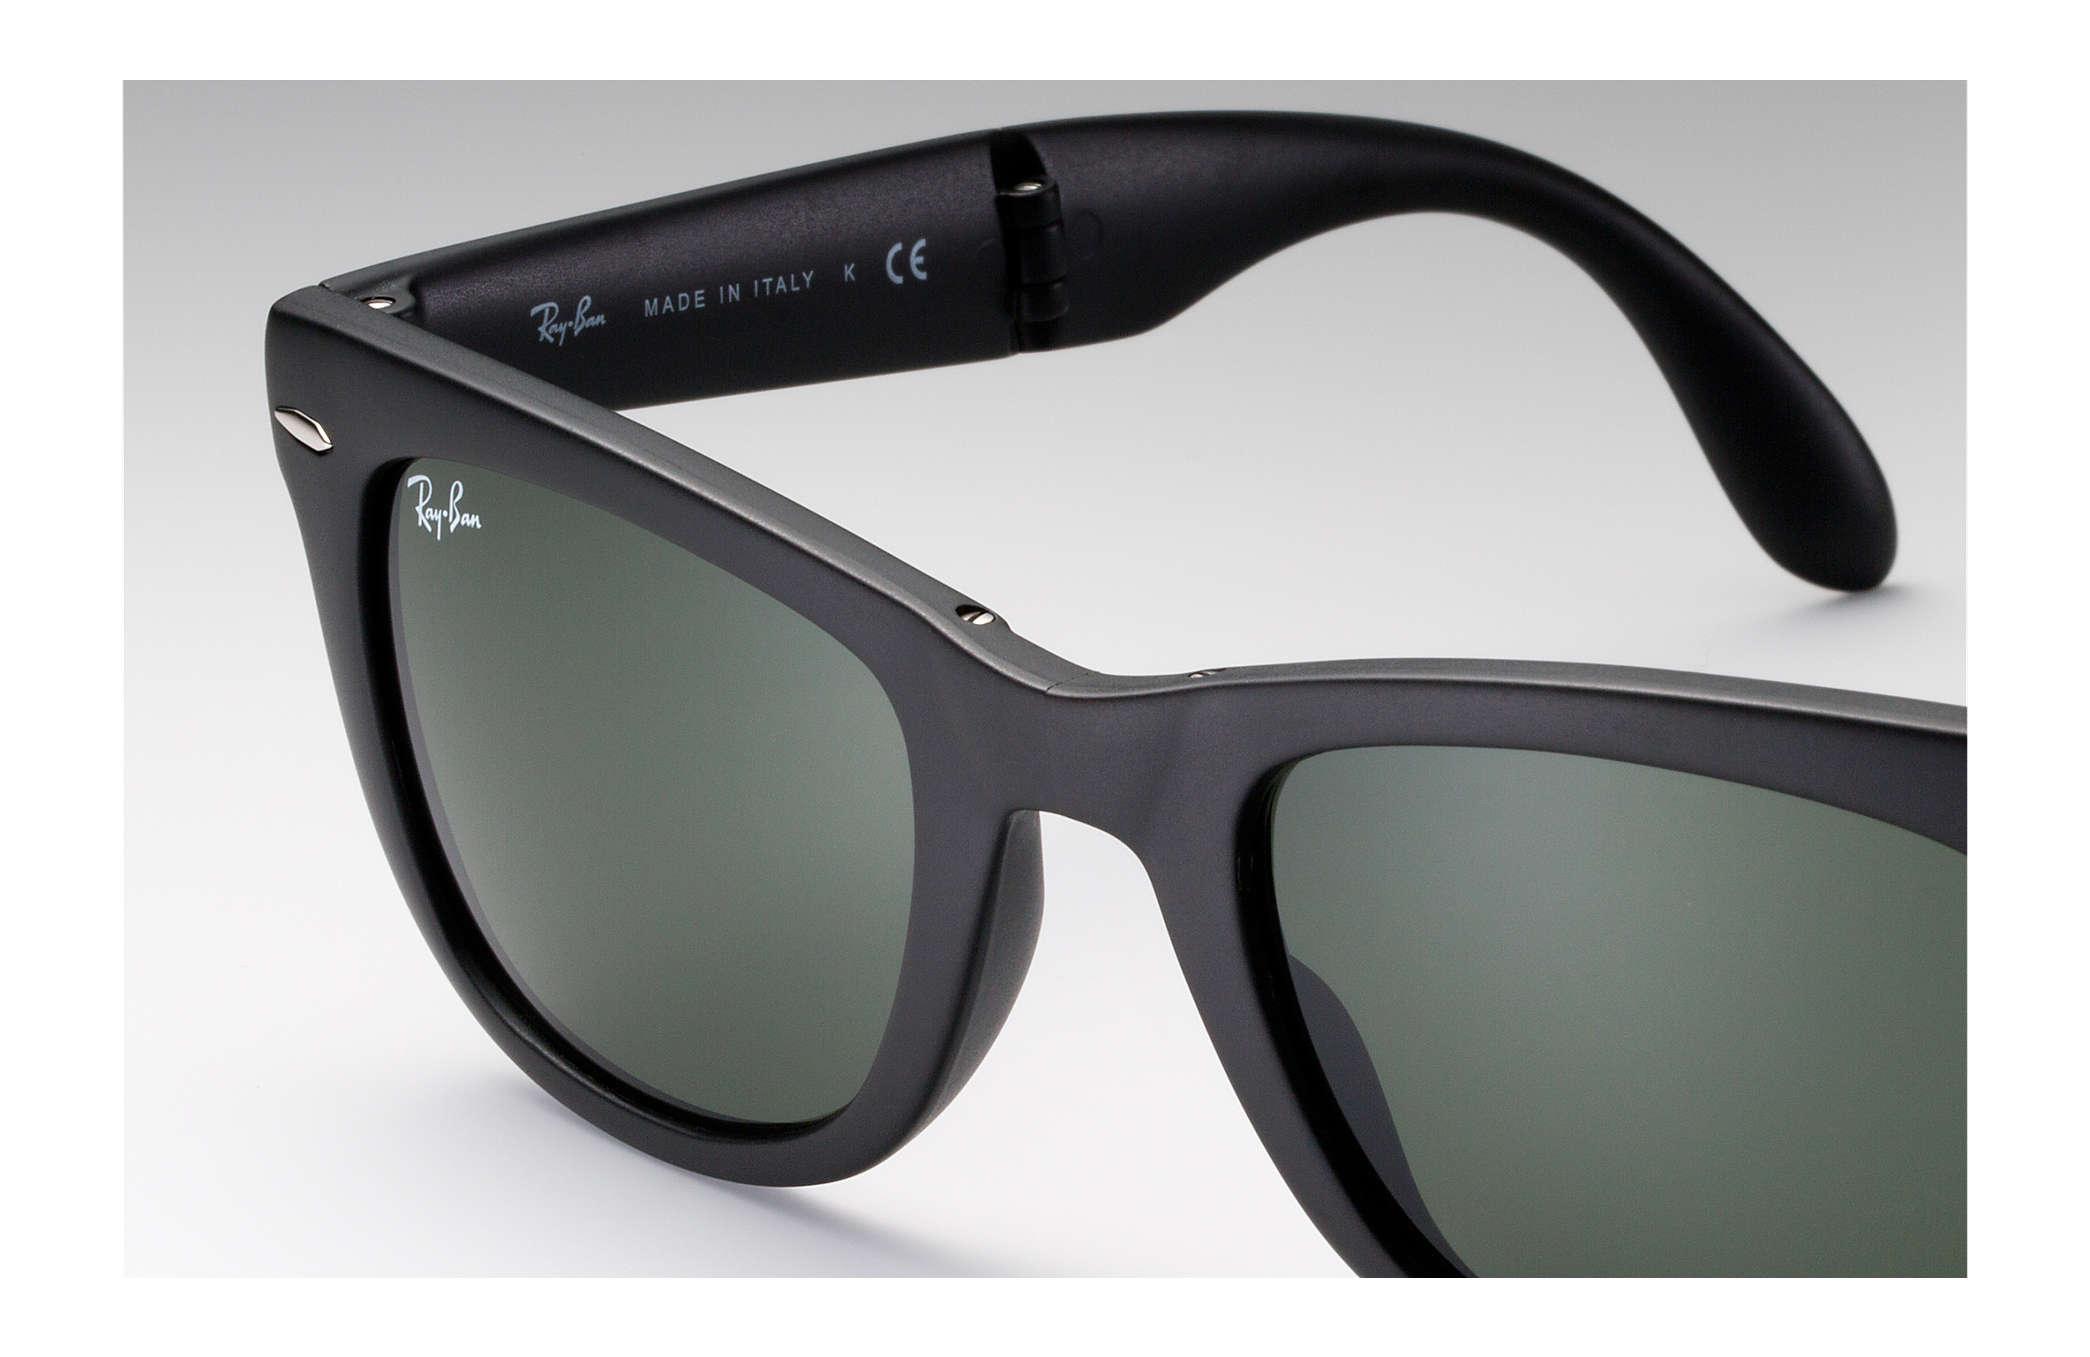 23d50807f8fde Ray-Ban Wayfarer Folding Classic RB4105 Black - Nylon - Green Lenses ...